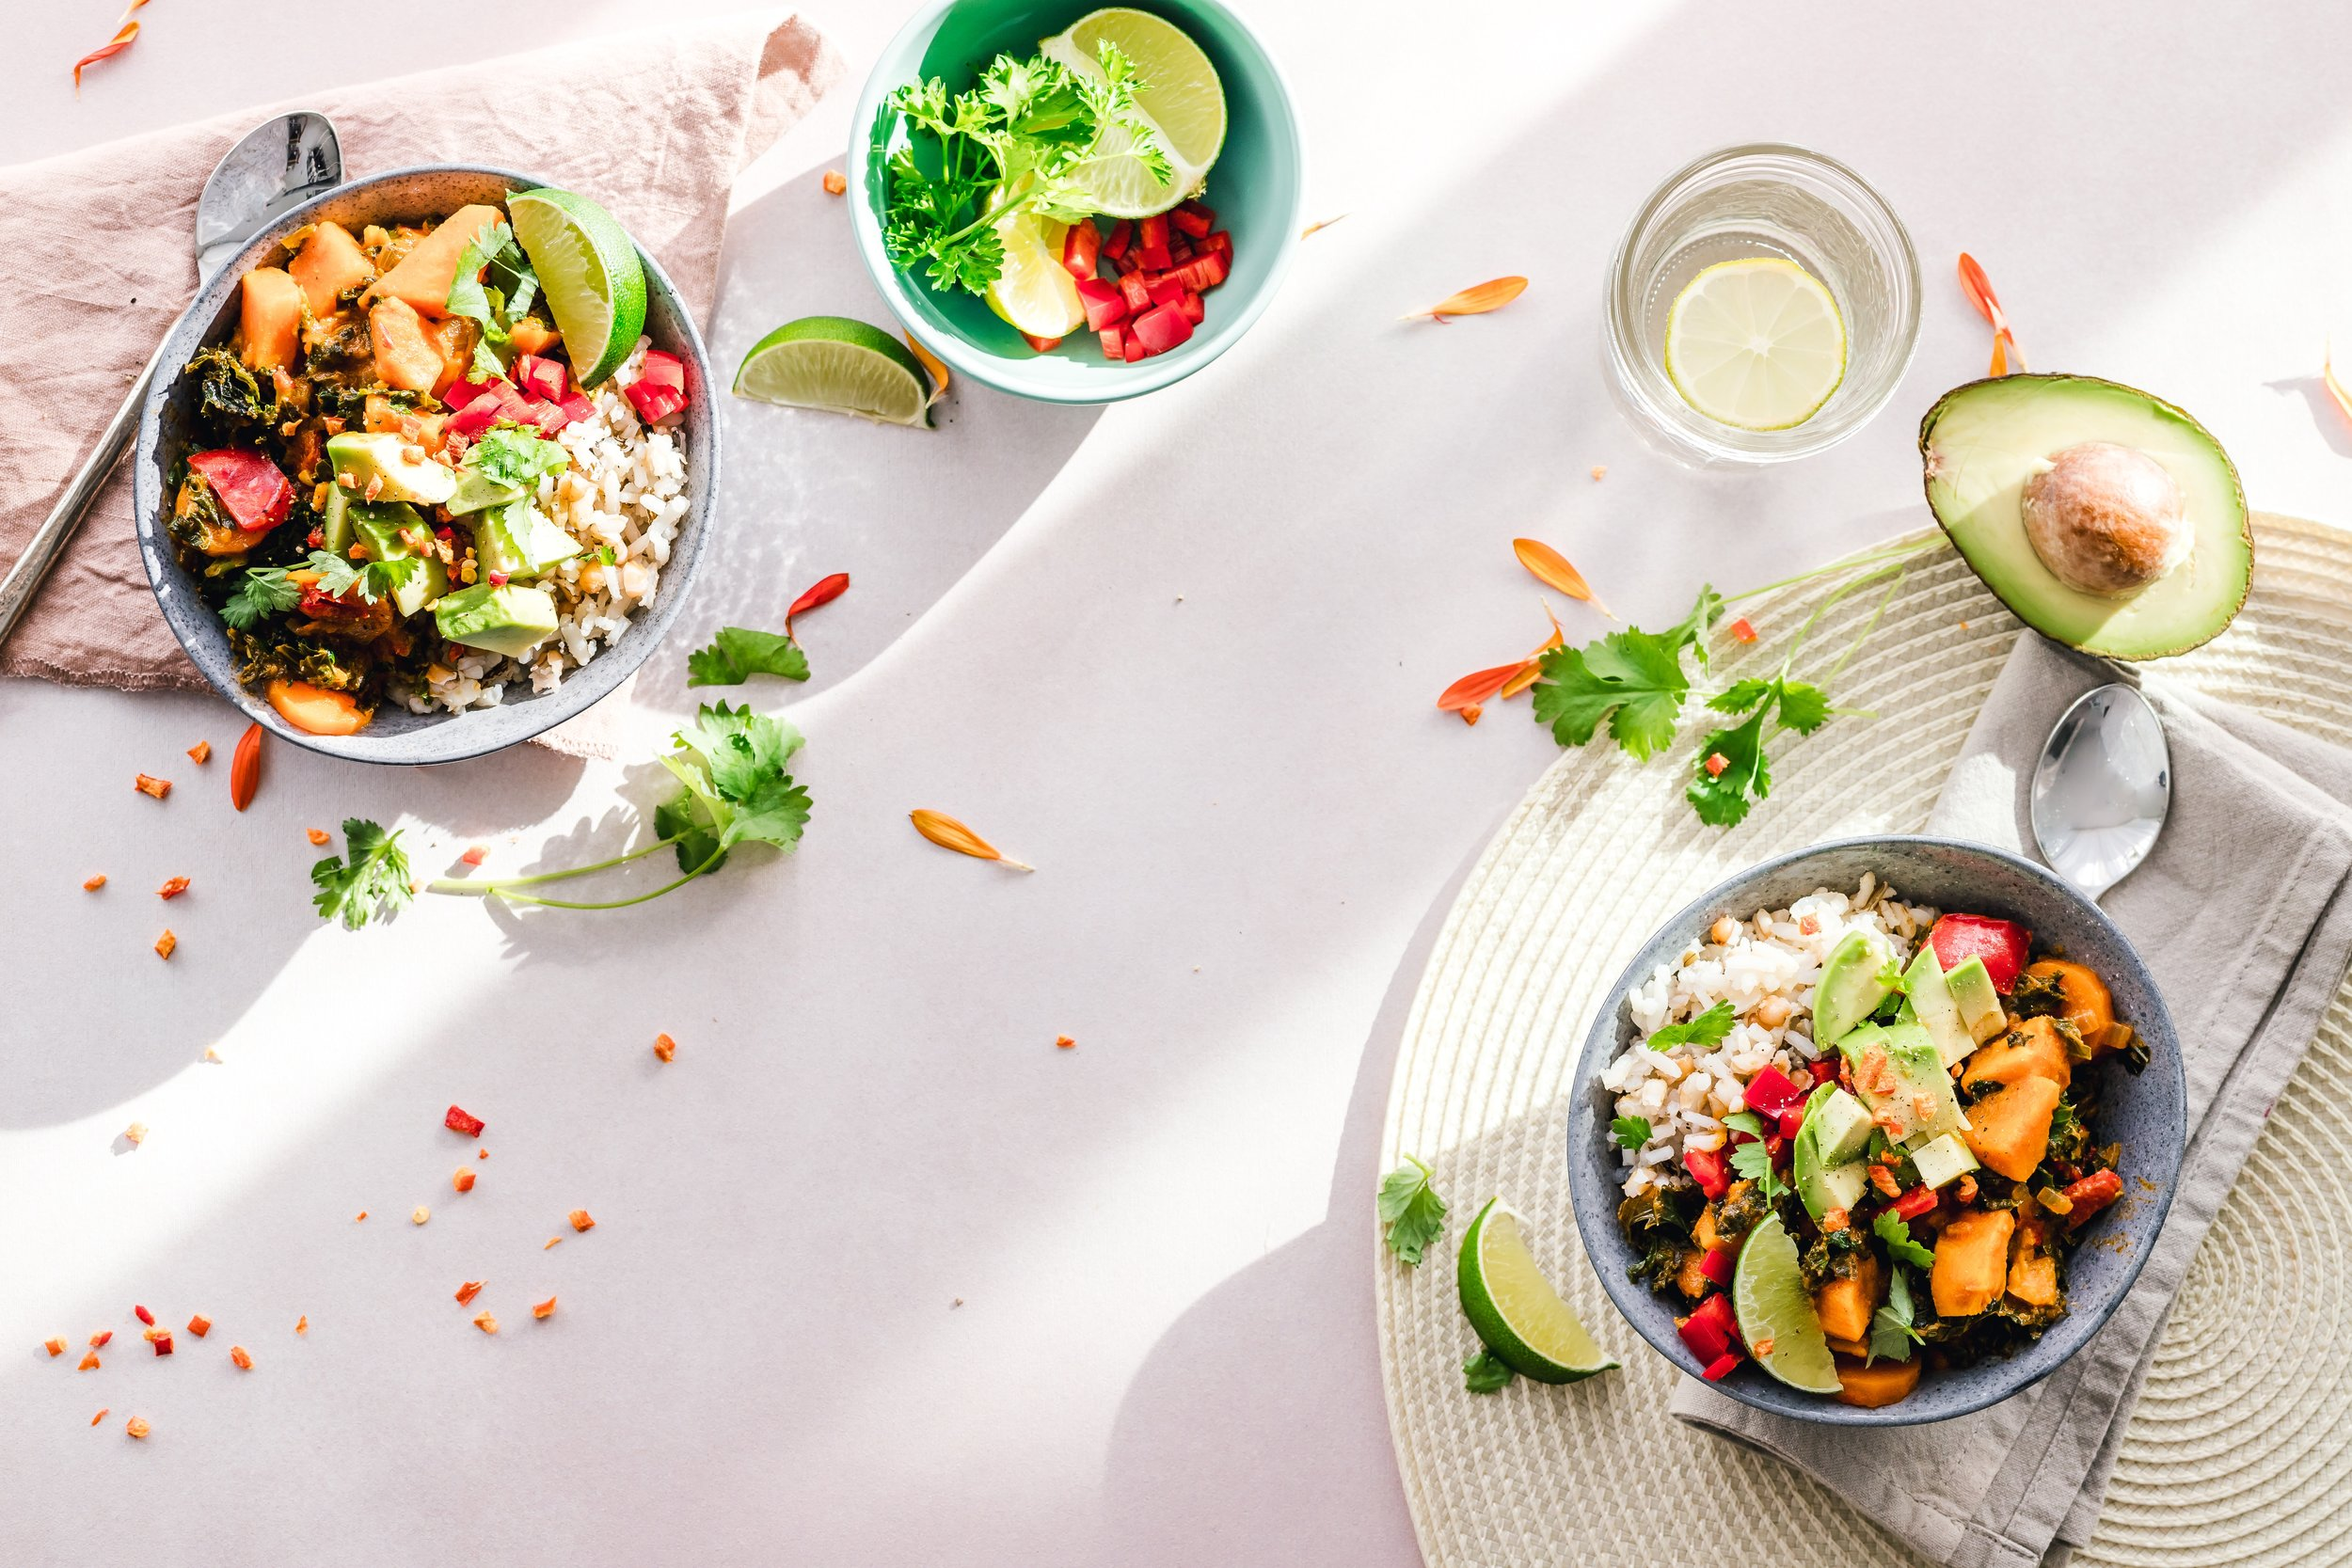 appetizer-bowls-cuisine-1640770.jpg